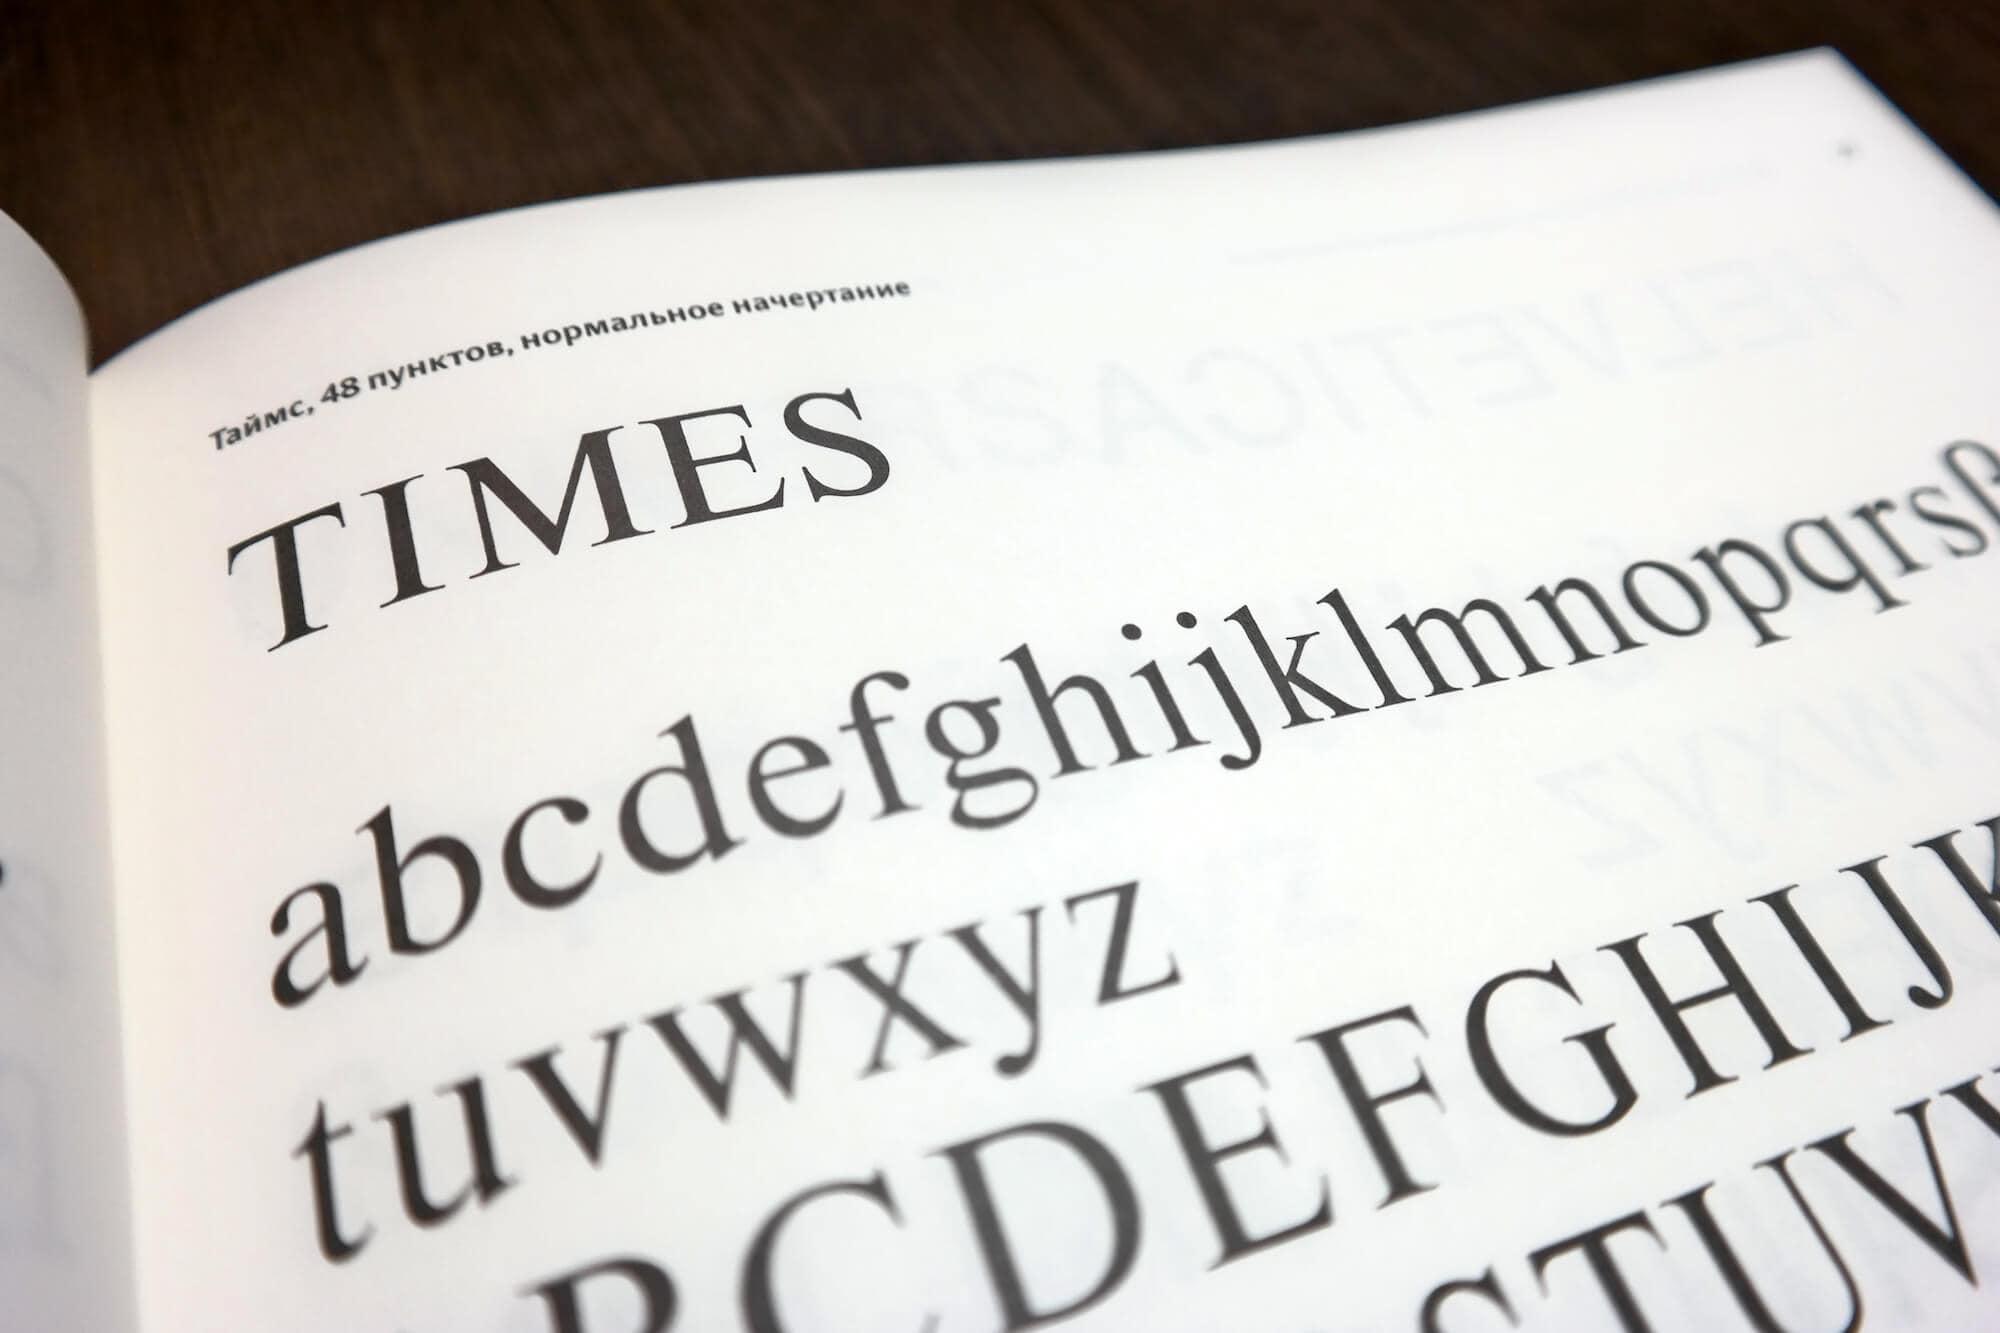 Шрифт Таймс Нью Роман разработан в 1932 году для газеты «Таймс»